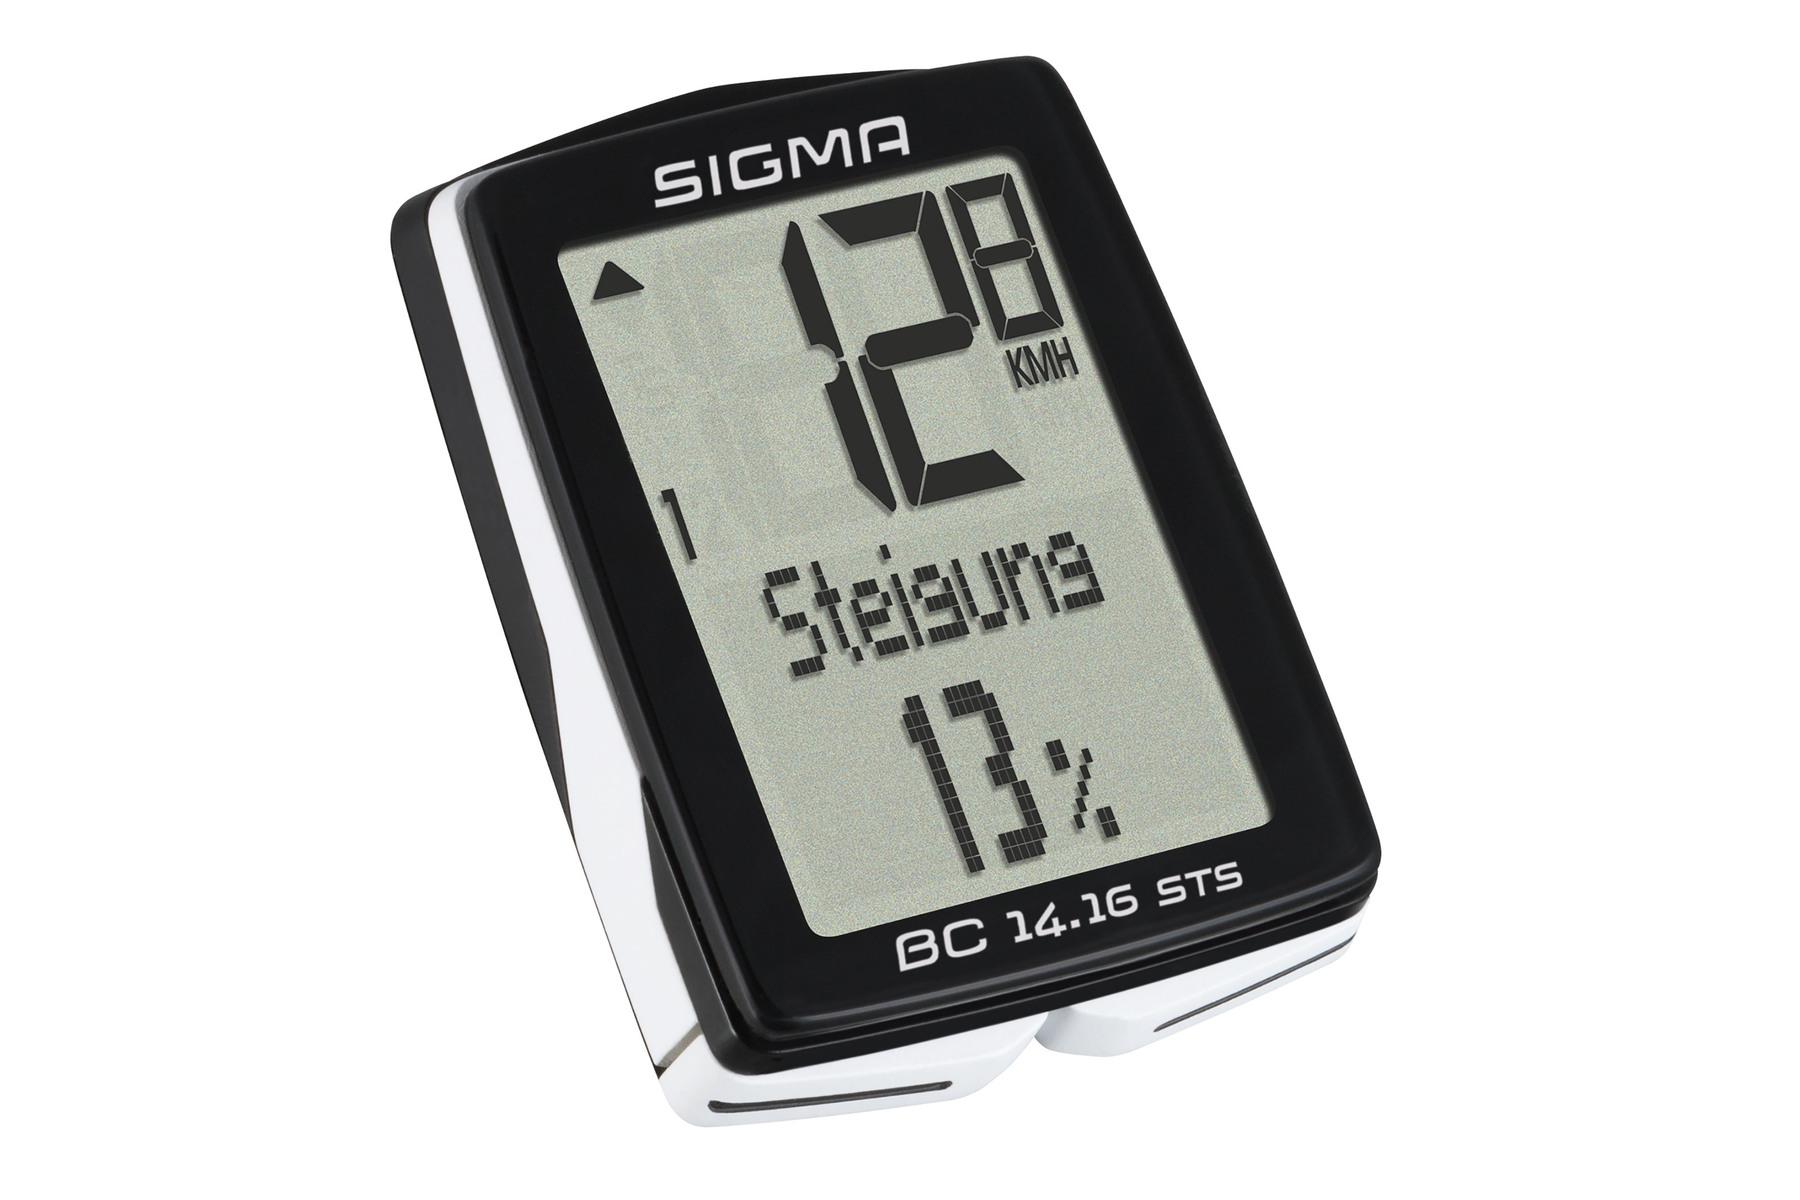 Sigma BC 14.16 STS CAD Fahrradcomputer -kabellos-